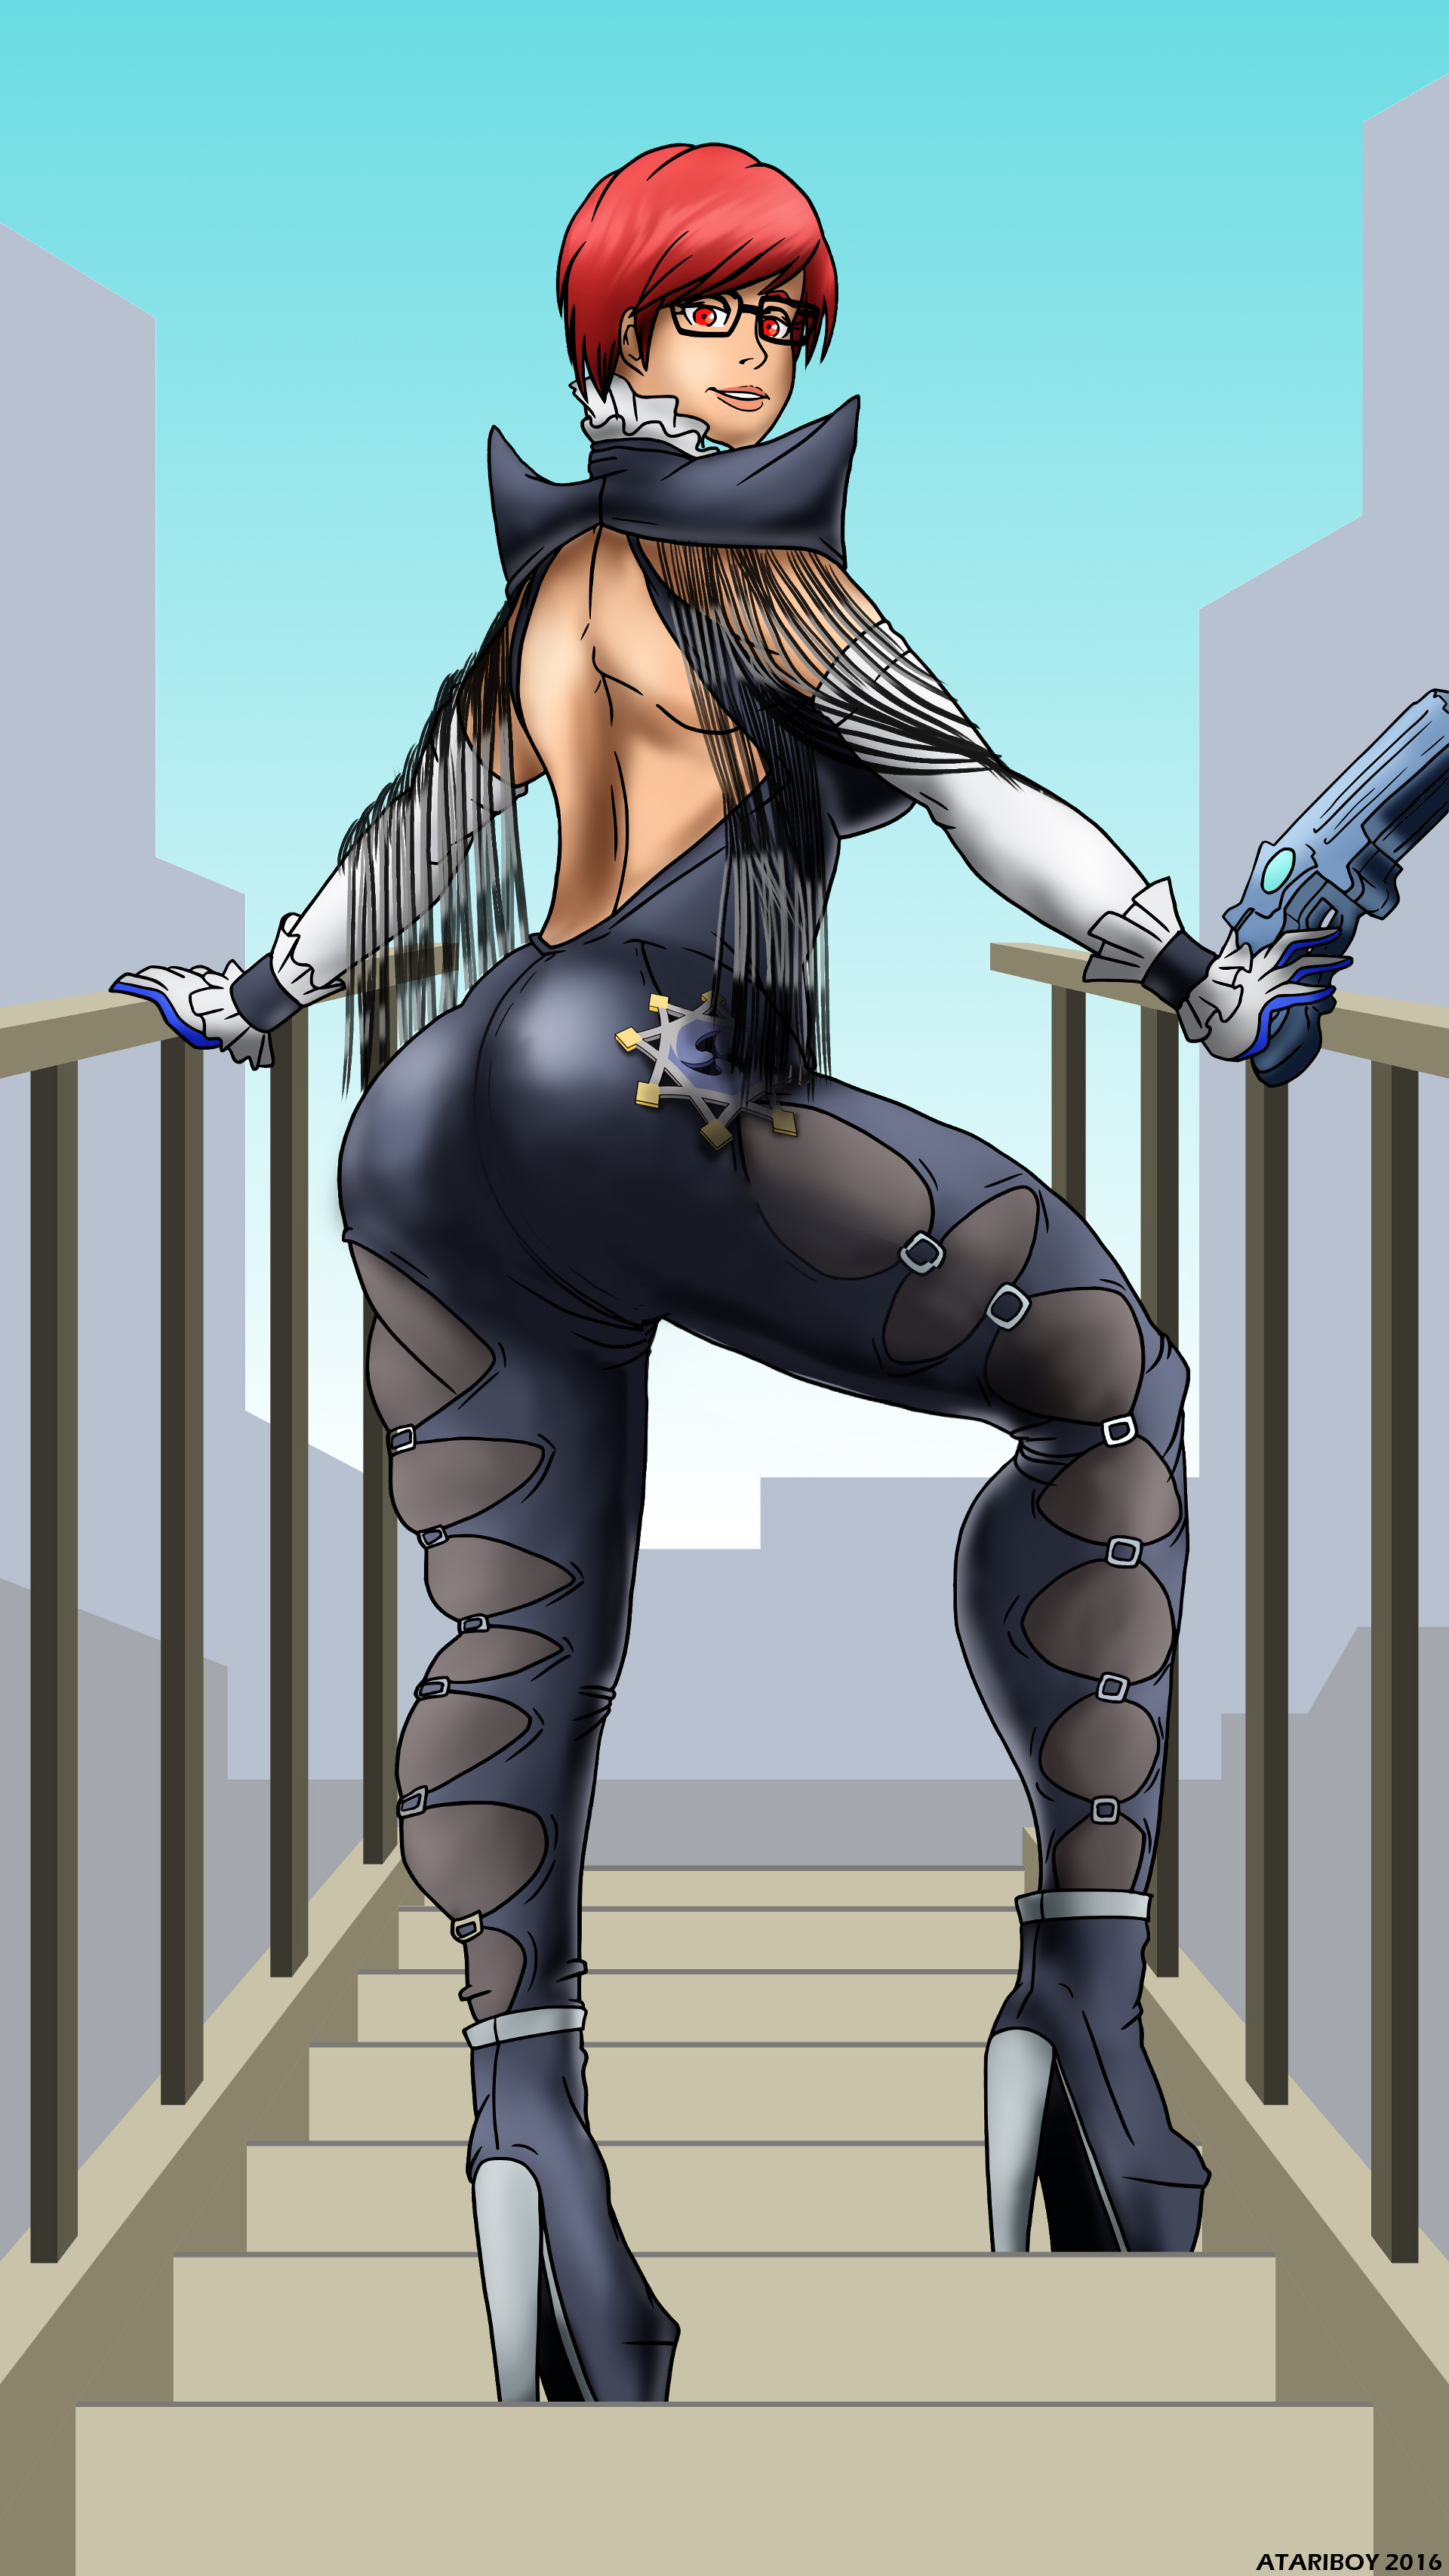 Laura Cosplaying as Bayonetta by DJWill on DeviantArt